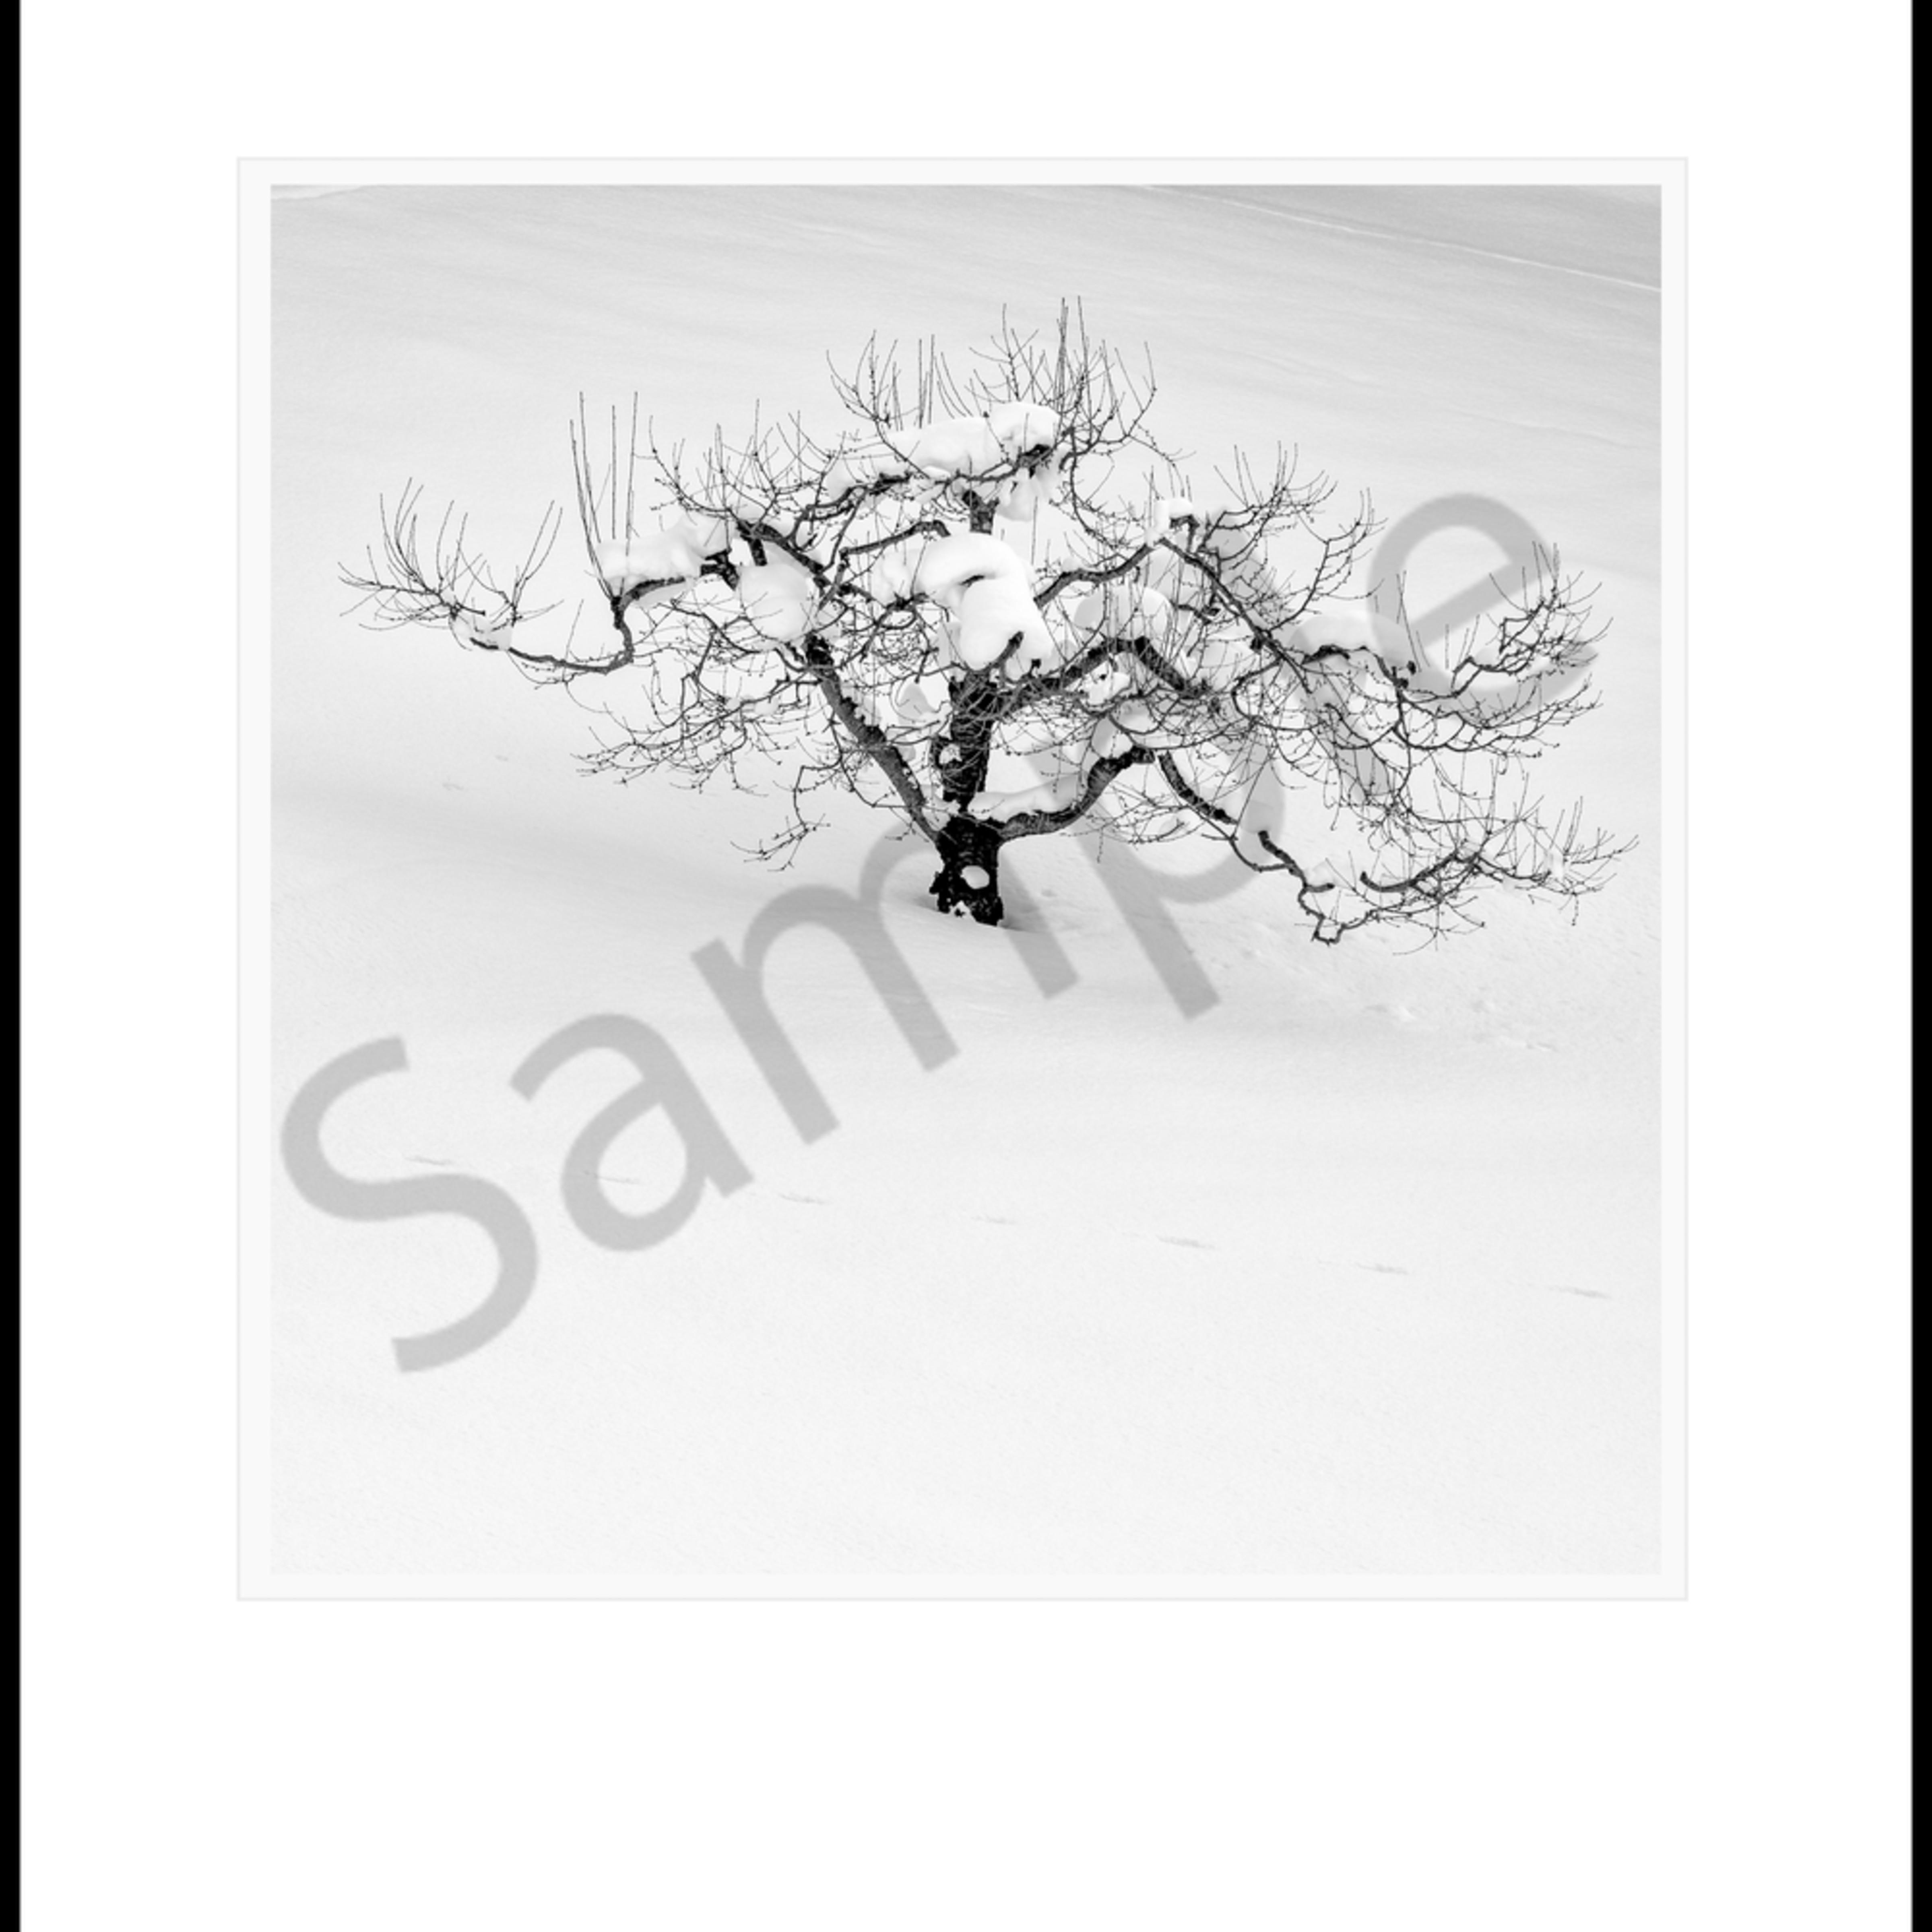 Orchard tree ujmdgu